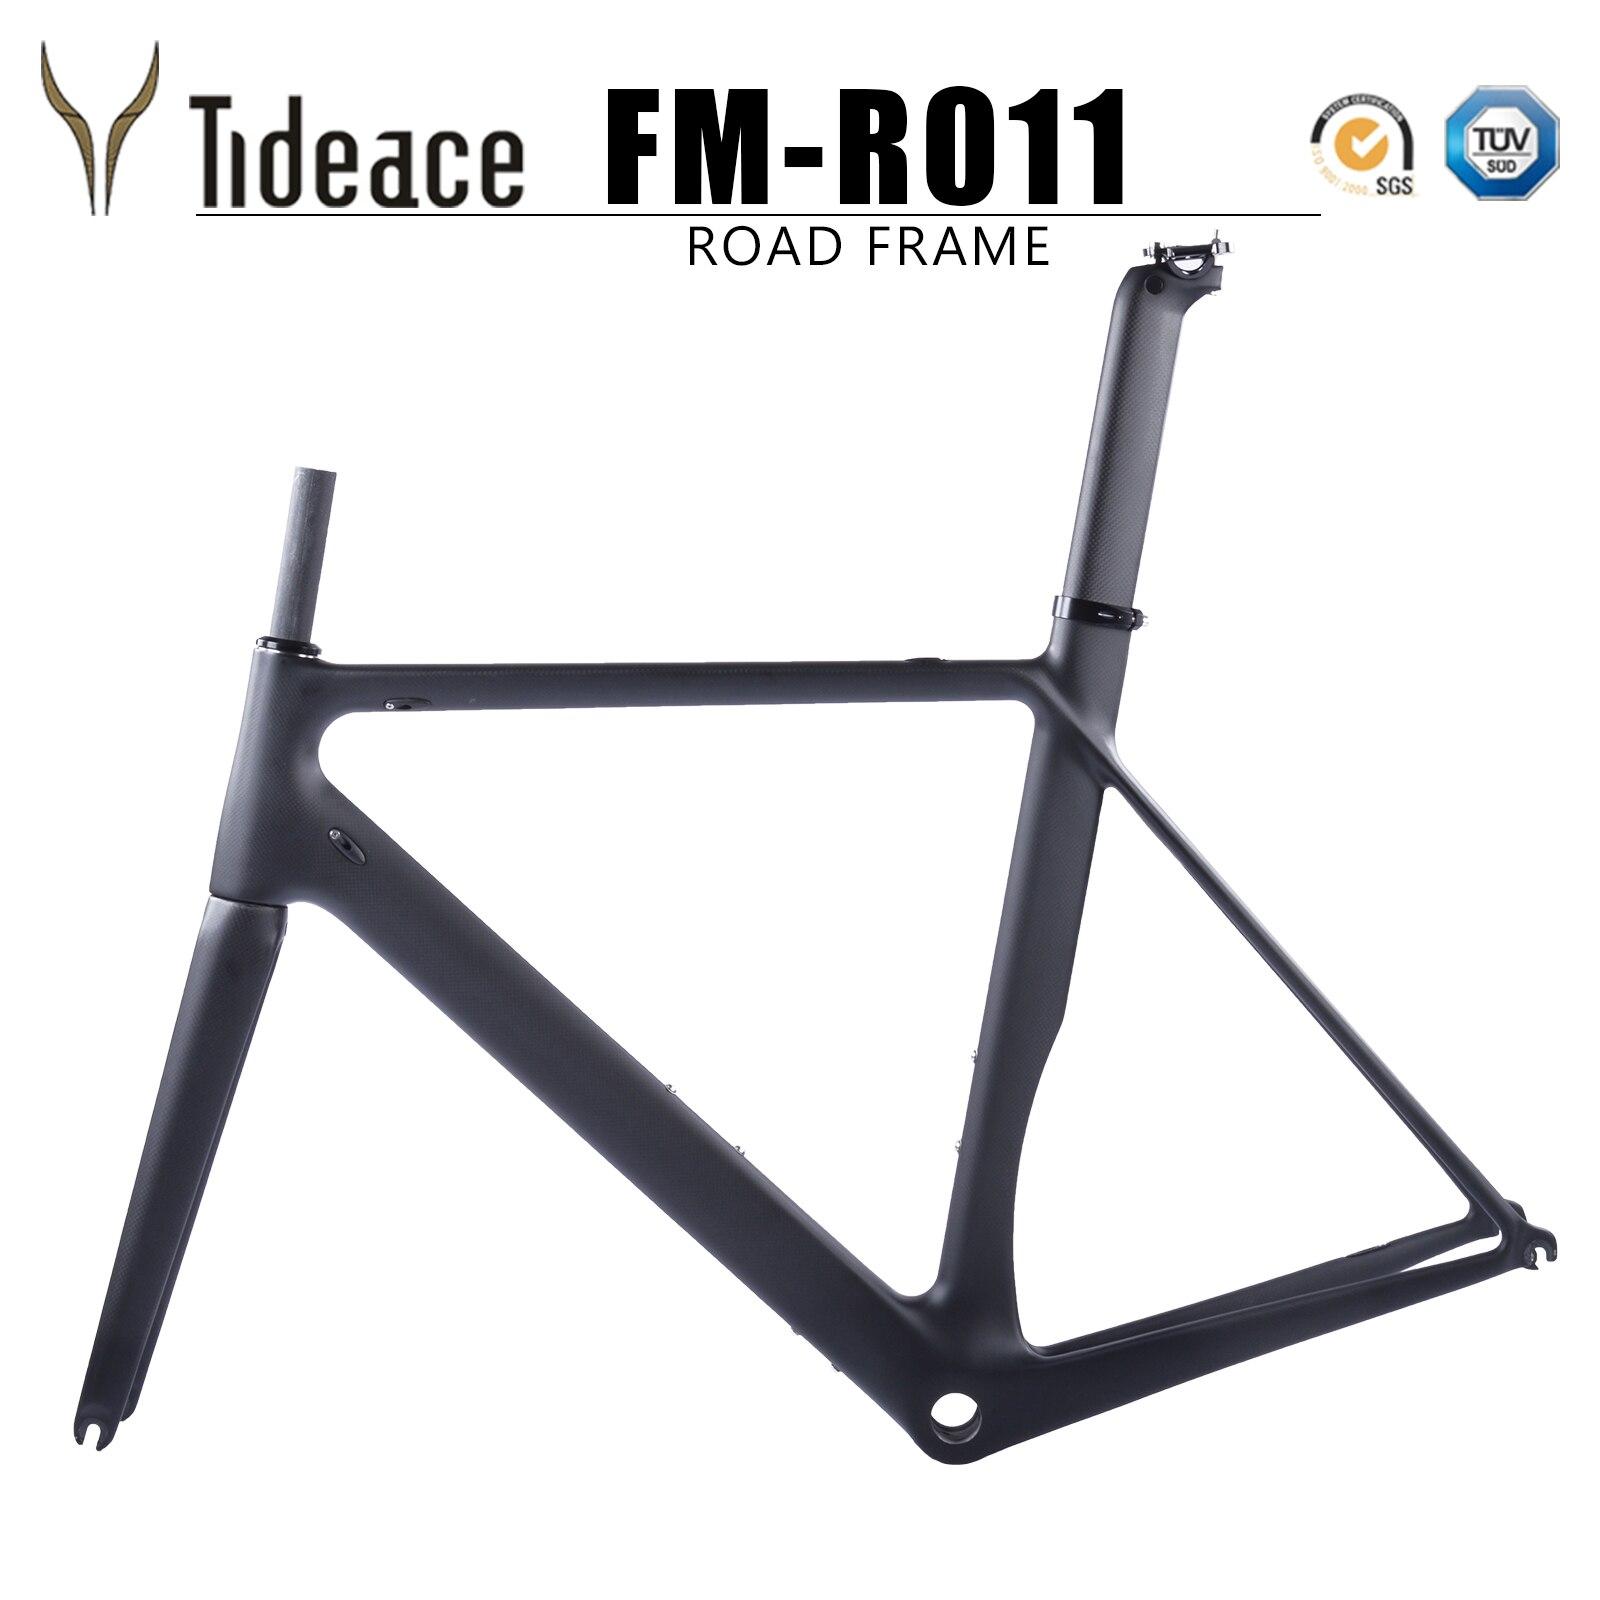 Tideace quadro da bicicleta de fibra de carbono estrada bicicleta conjunto de quadros quadro de carbono corridas de estrada de carbono super leve aceitar DIY